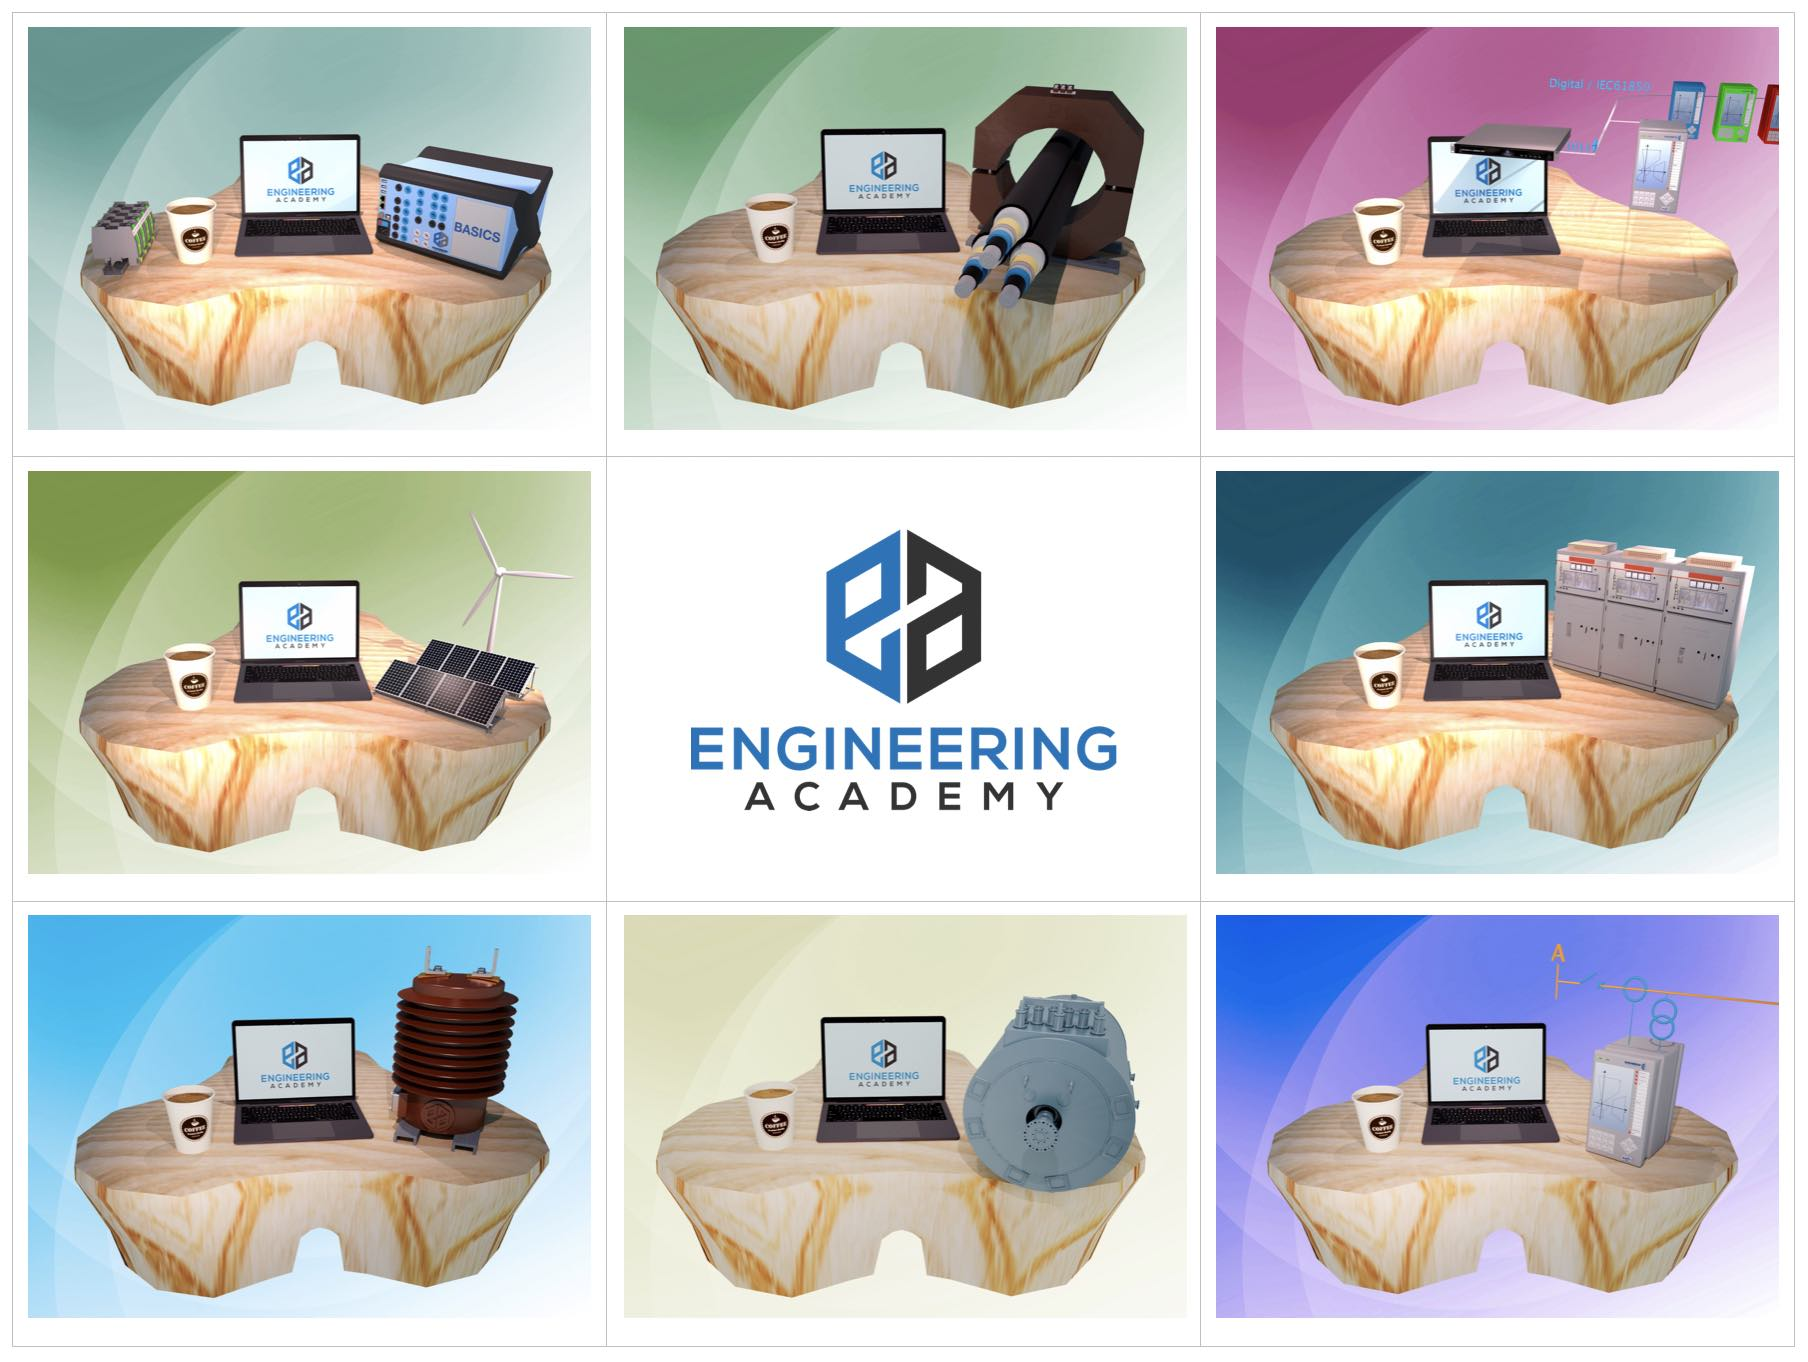 Engineering Academy Elektrotechnik Schulungen Seminare Schutztechnik Leittechnik Sekundärtechnik Weiterbildung